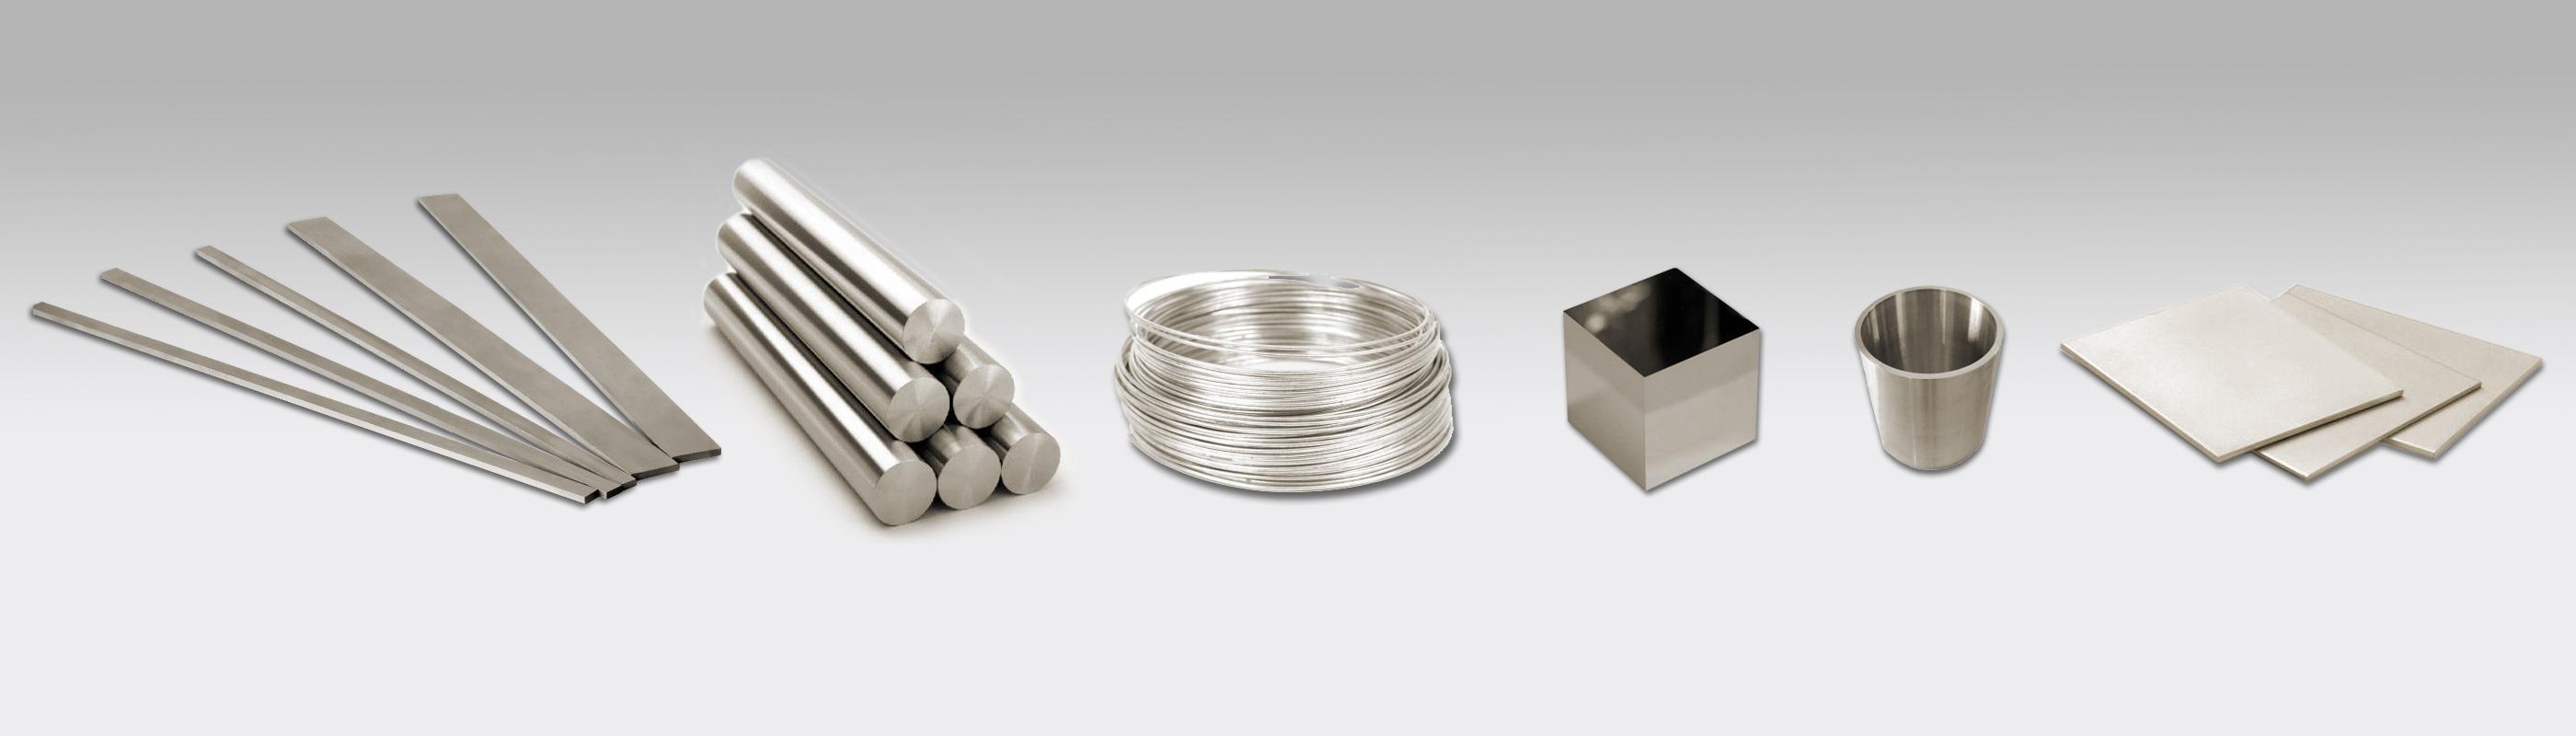 Future Alloys Special Metals UK Supplier